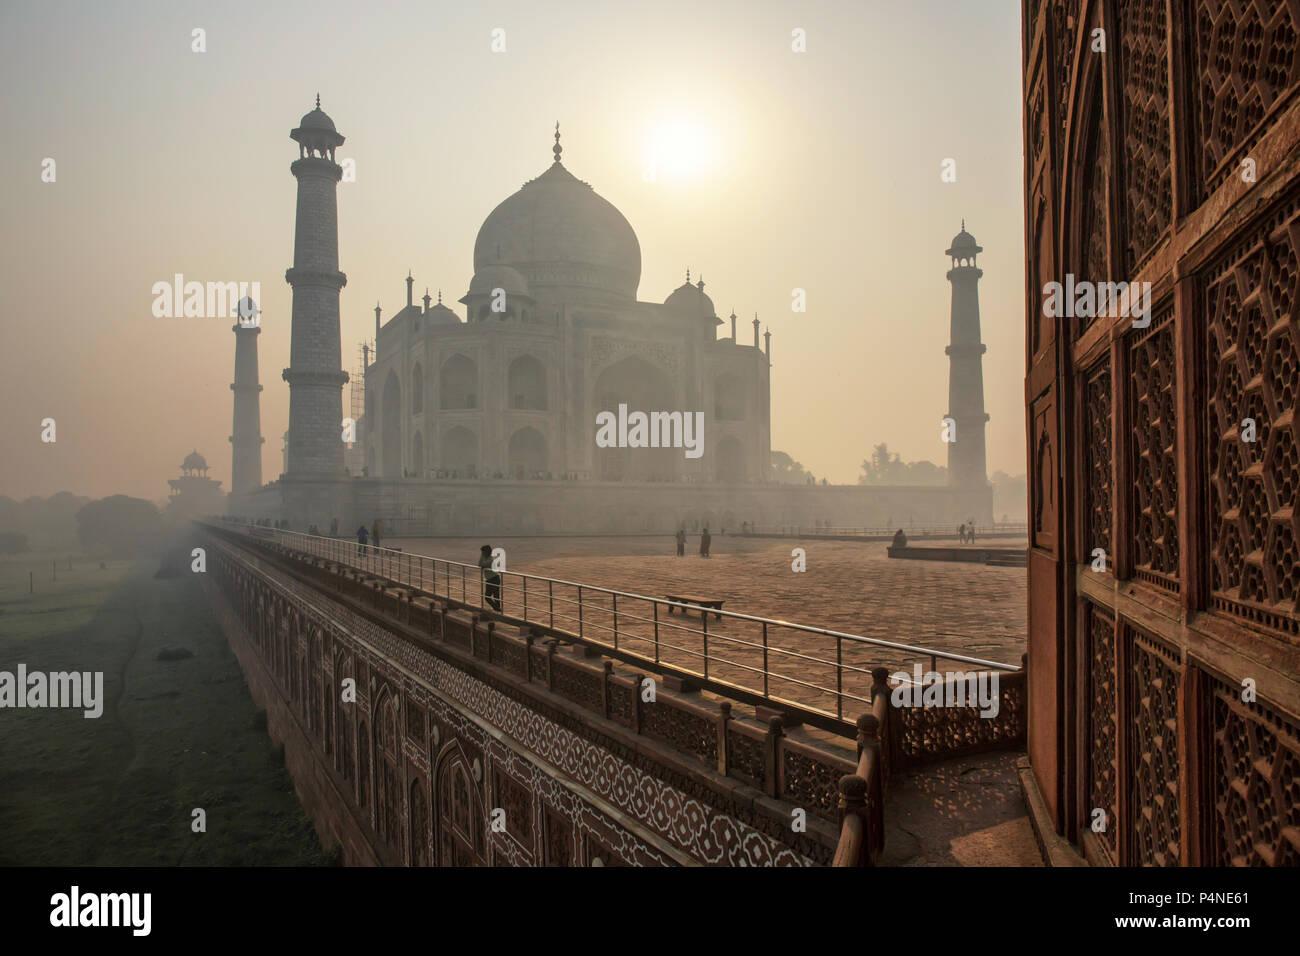 El hermoso Taj Mahal, en la mañana, Agra - India Imagen De Stock